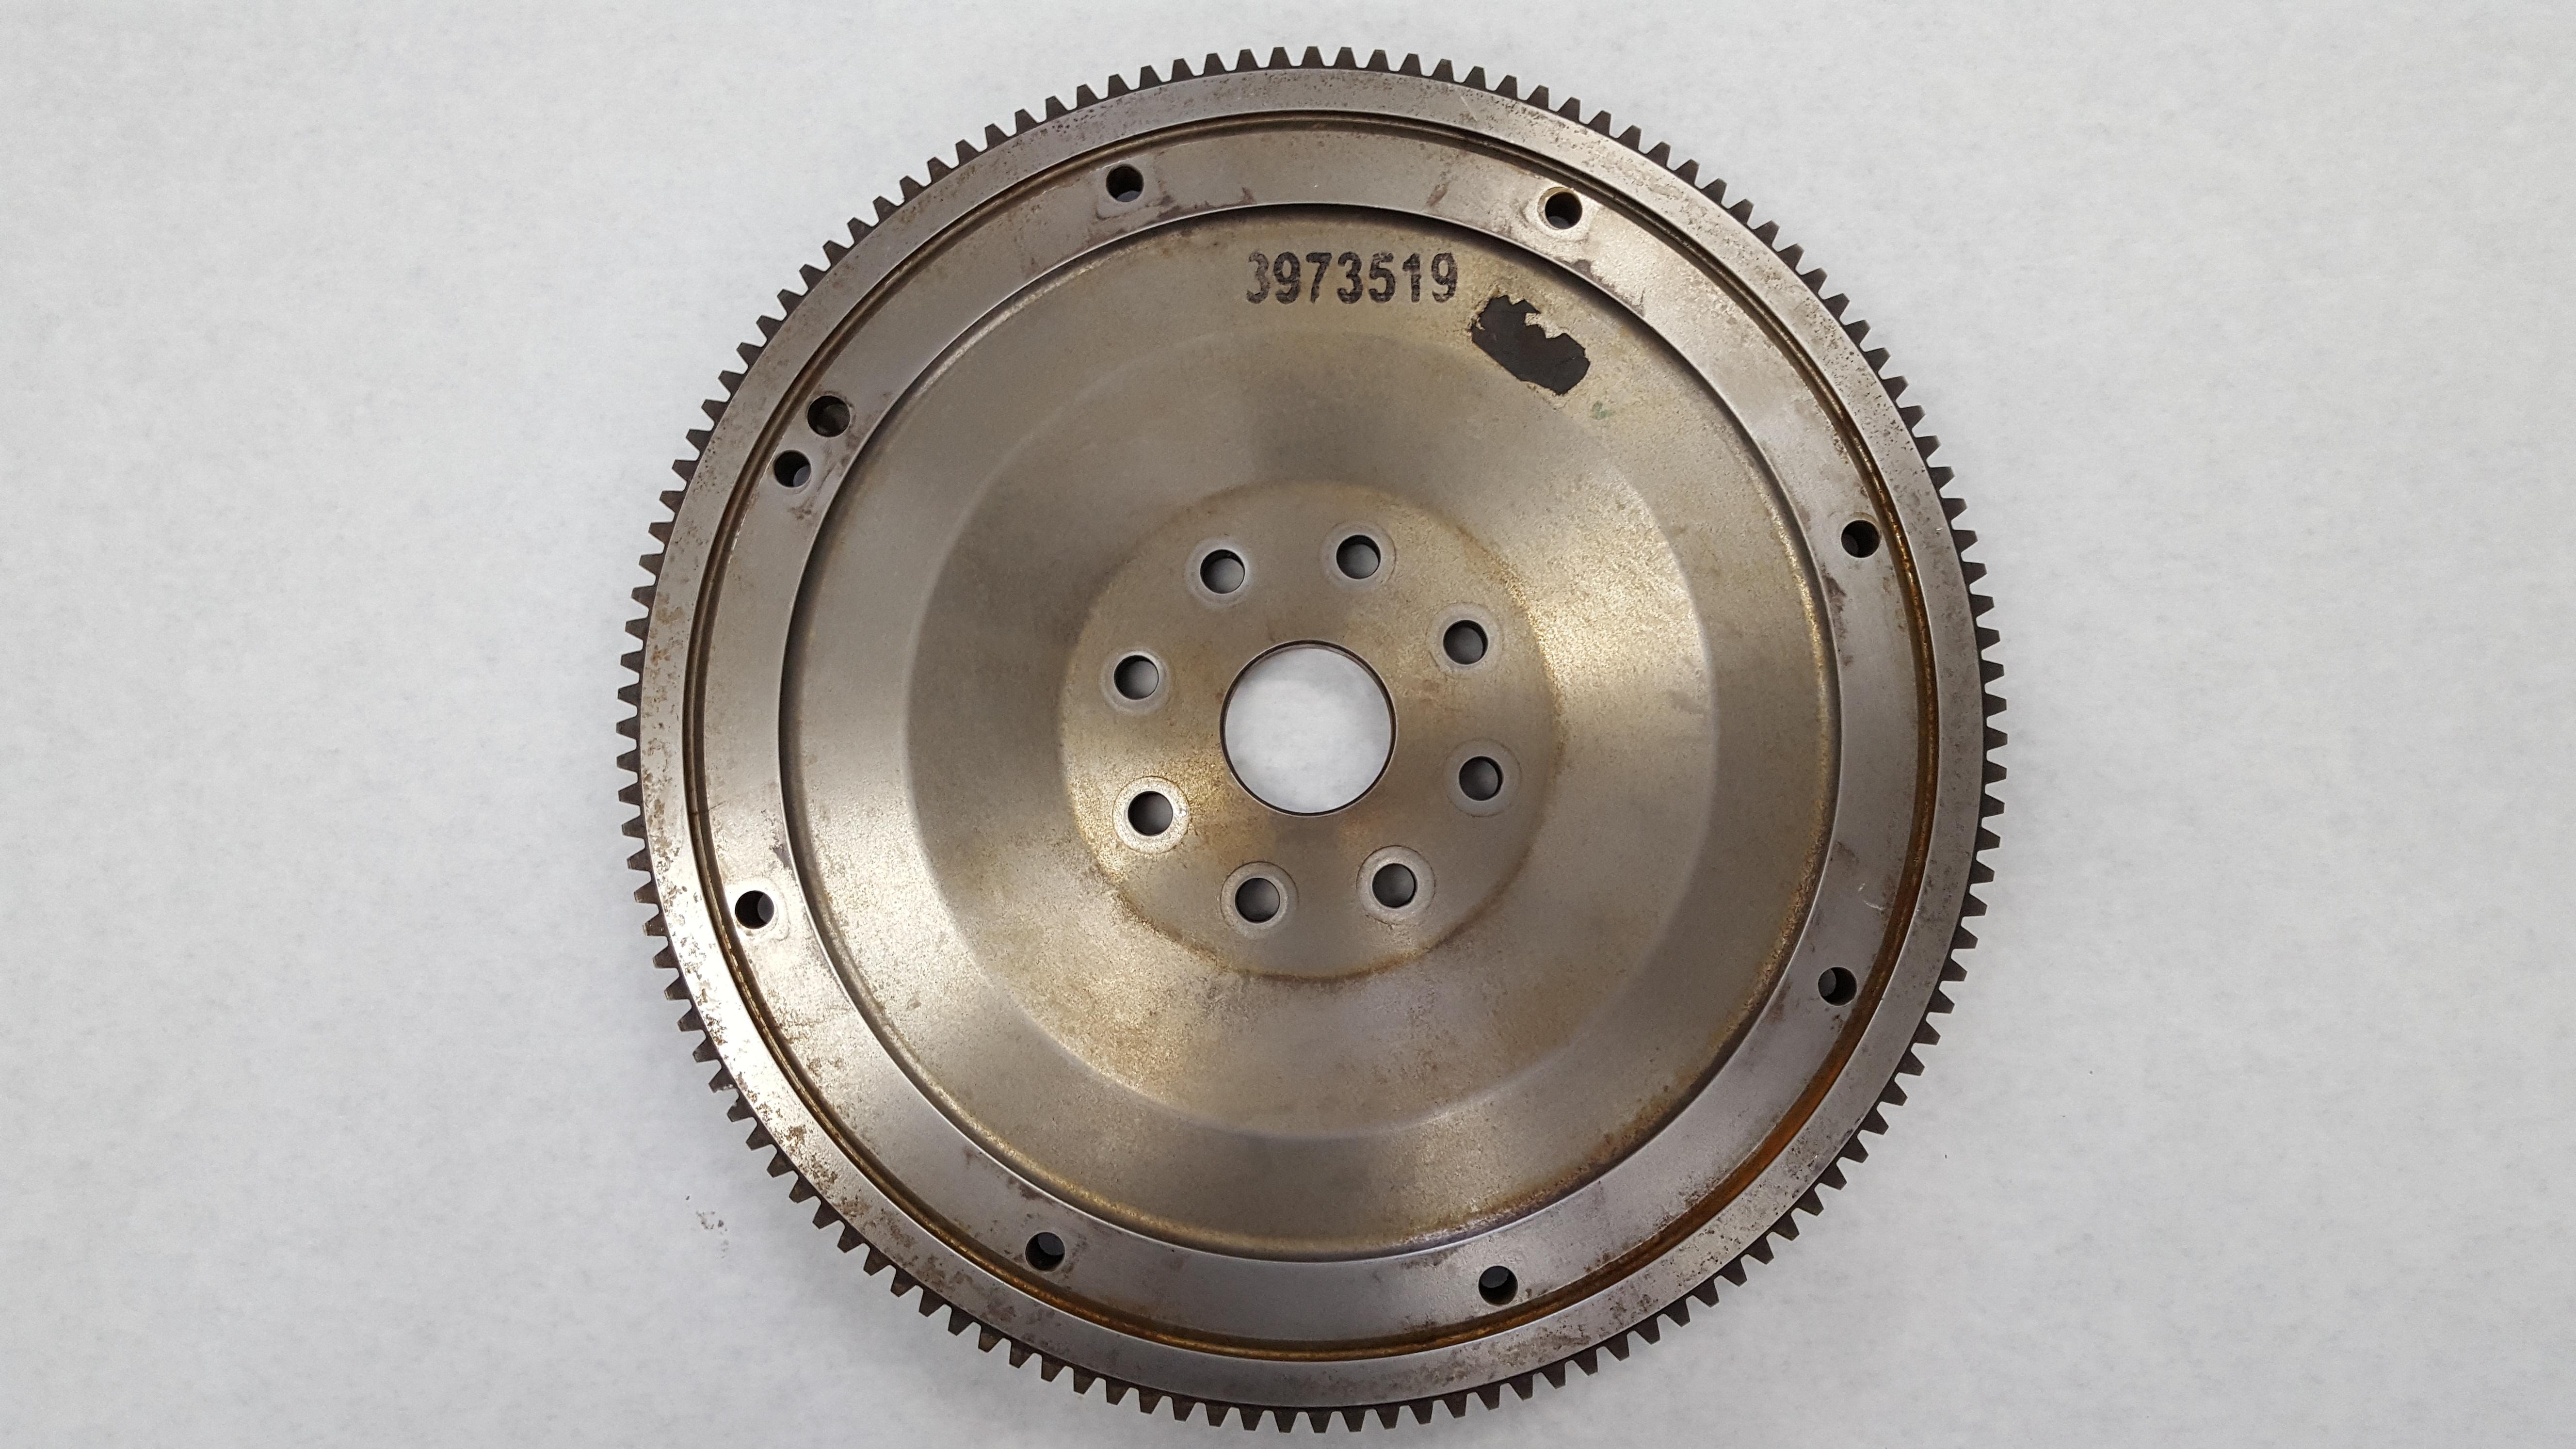 3973519 Cummins Flywheel Front View